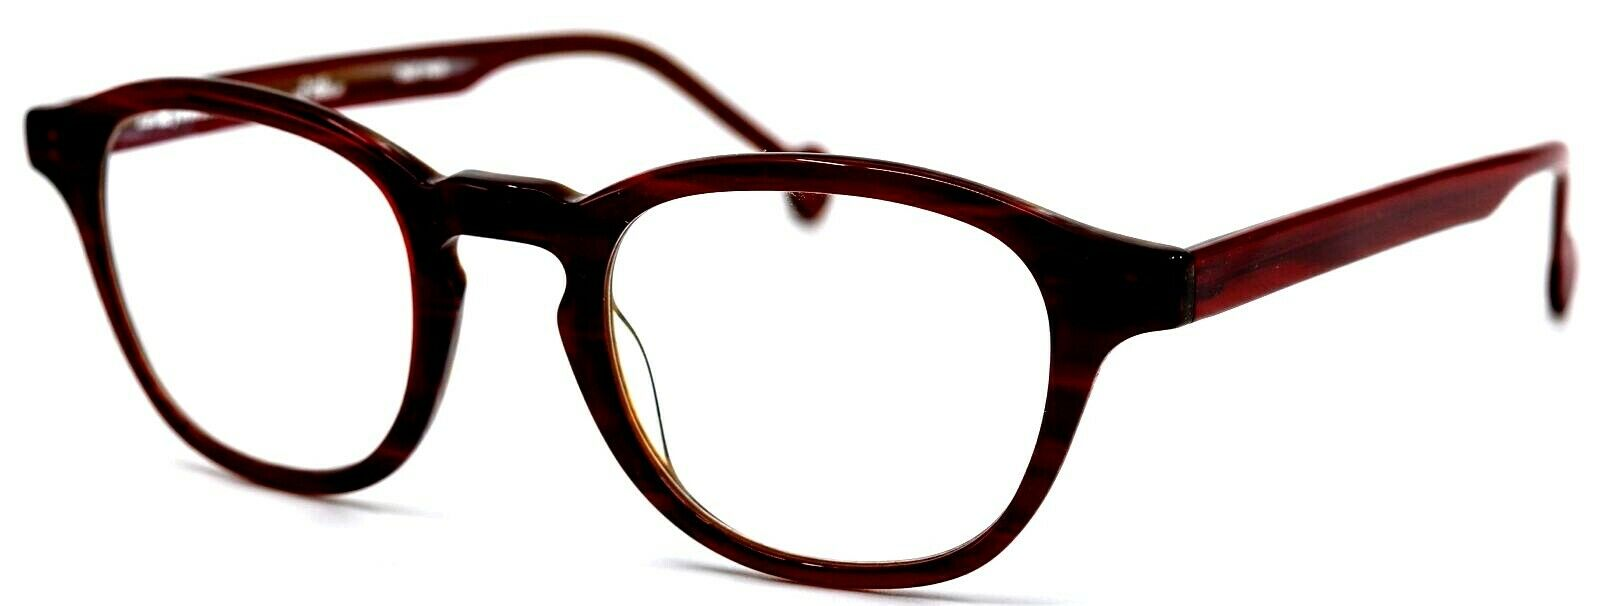 EyeWorks Titanium Red Sunglasses Unisex Brand New Designer L.A